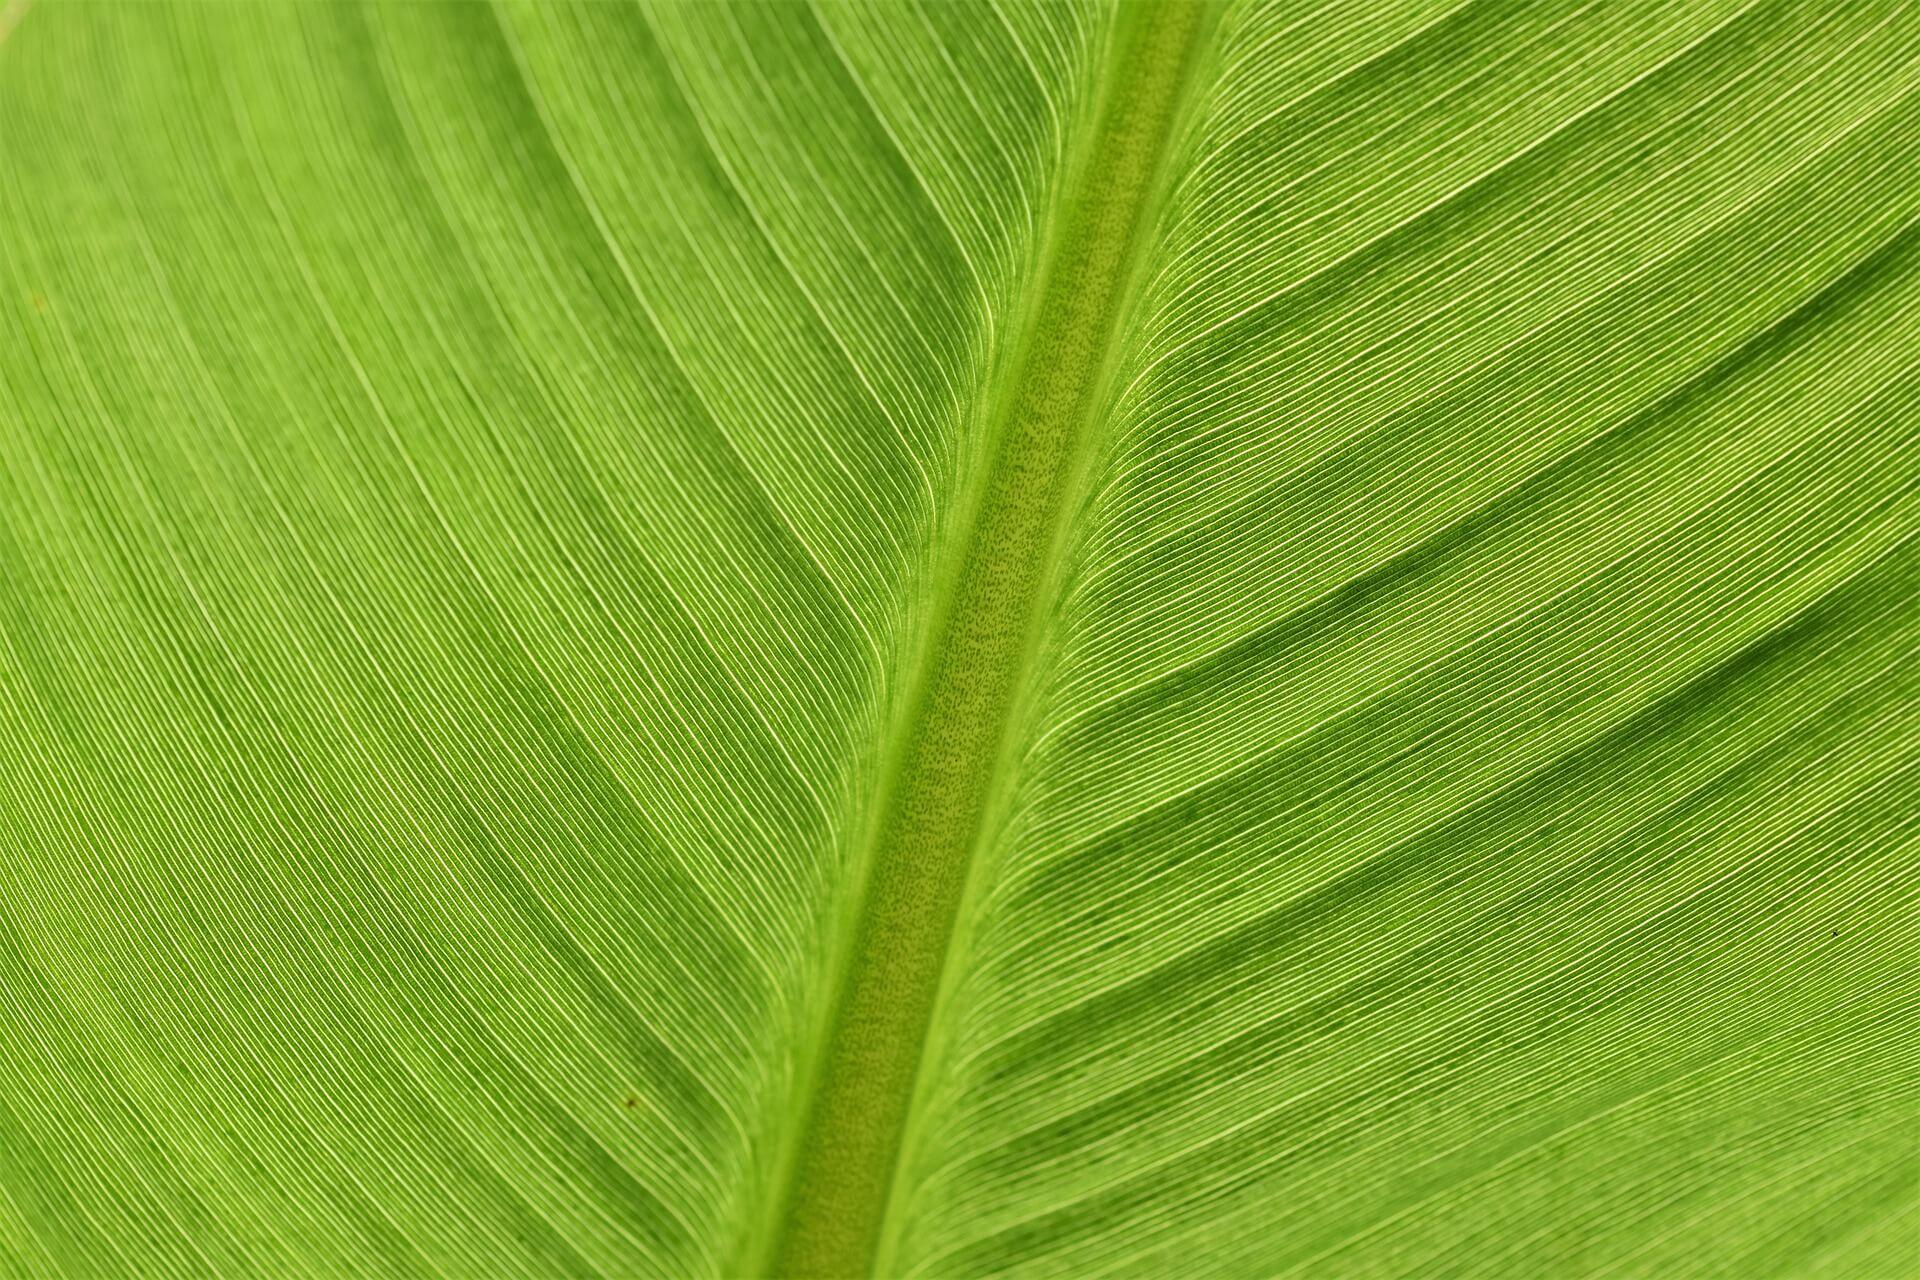 bananenblatt bild